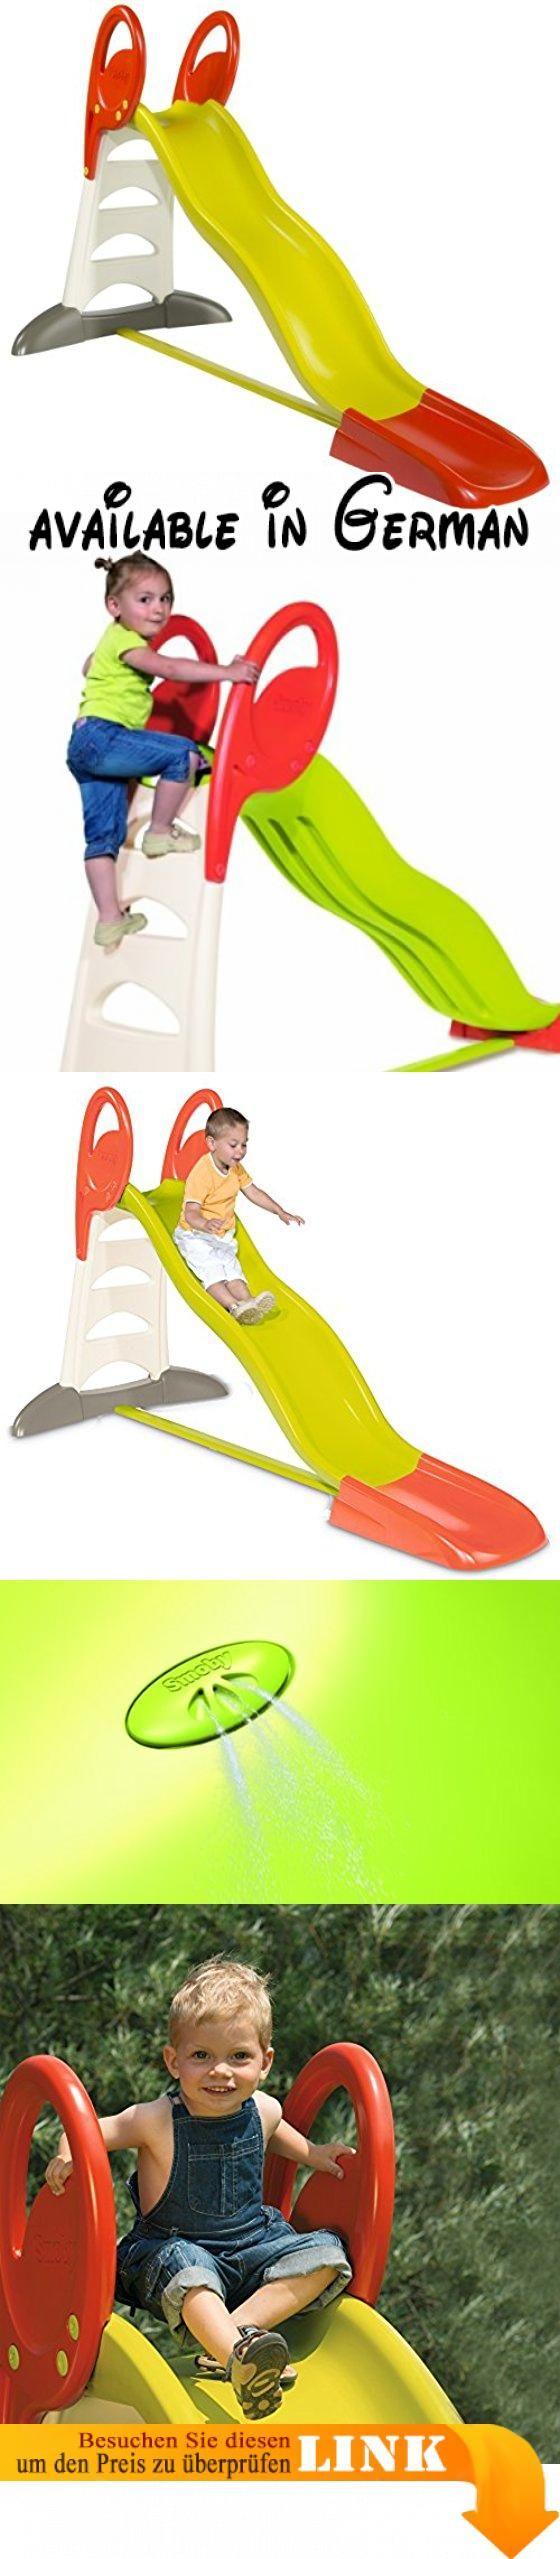 Spielhaus Garten Kunststoff Smoby: Smoby Smo